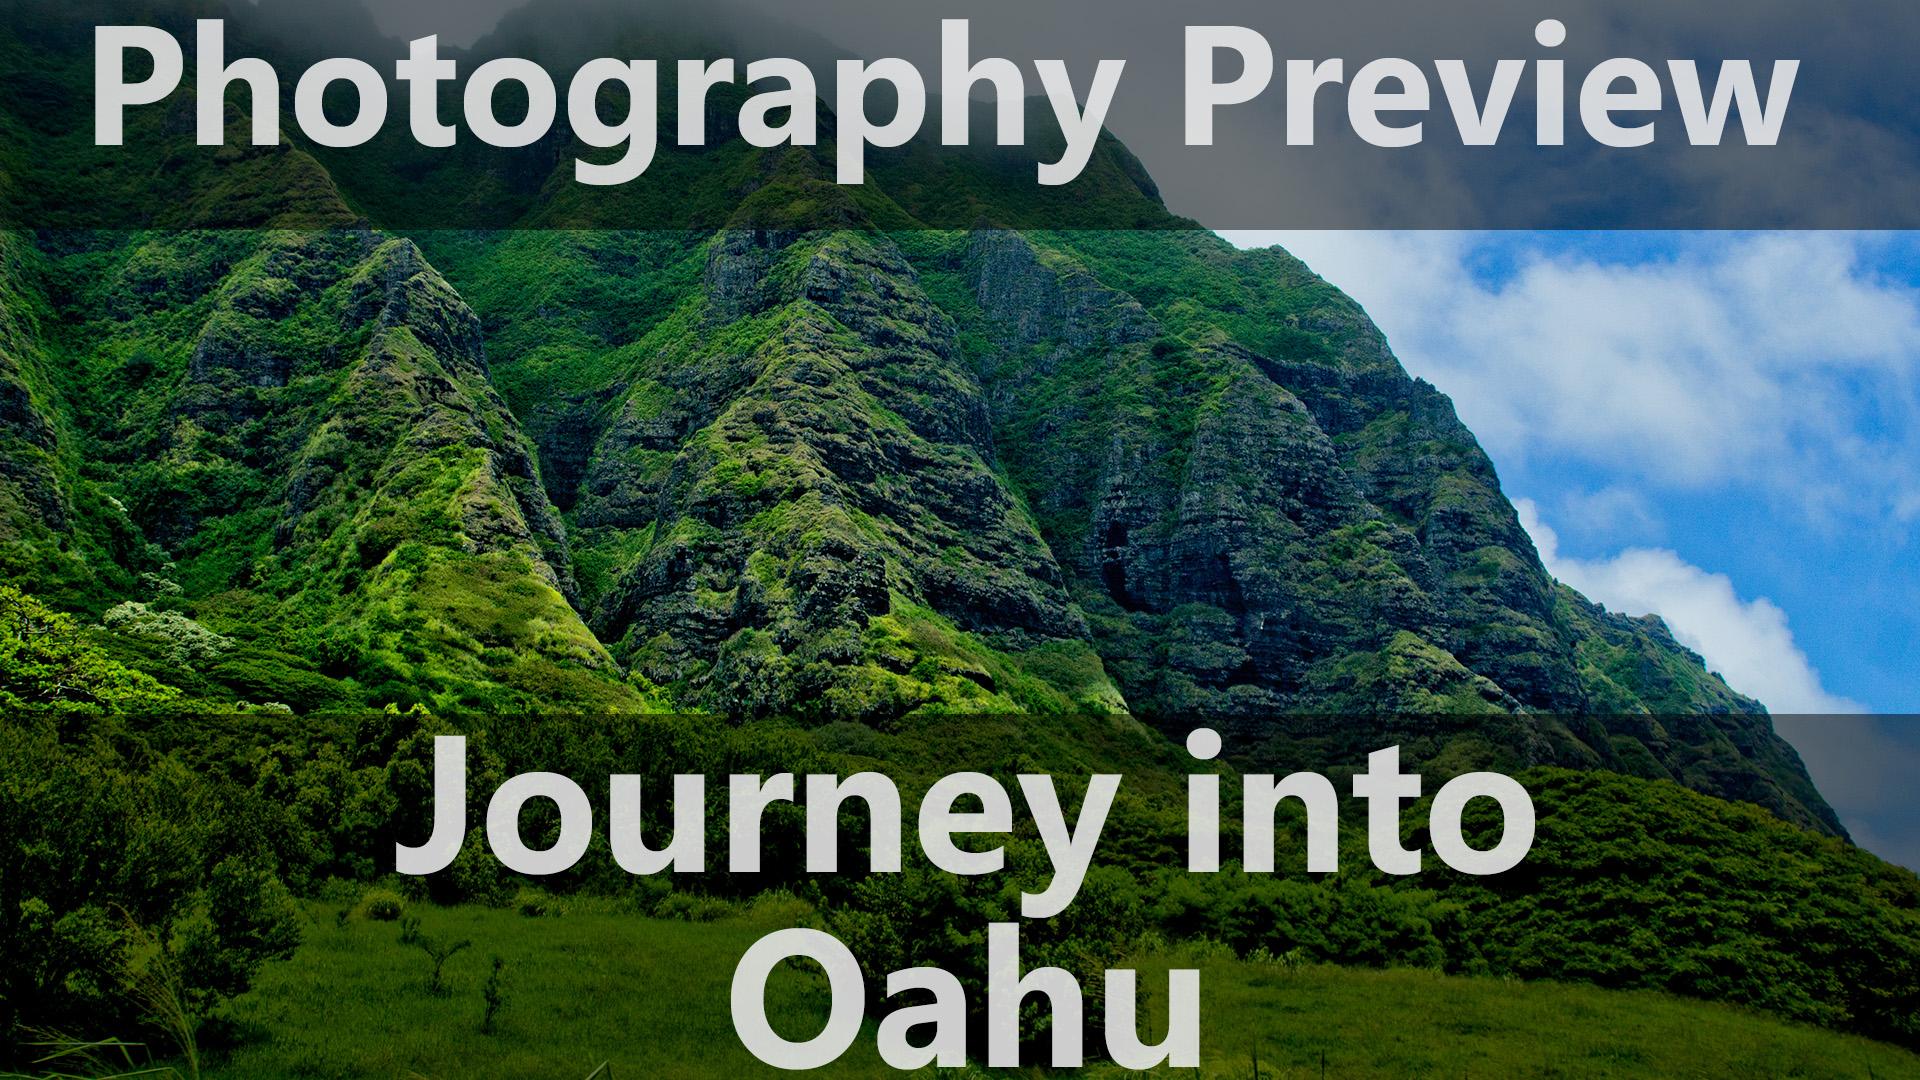 Journey Into Oahu THM 5.jpg